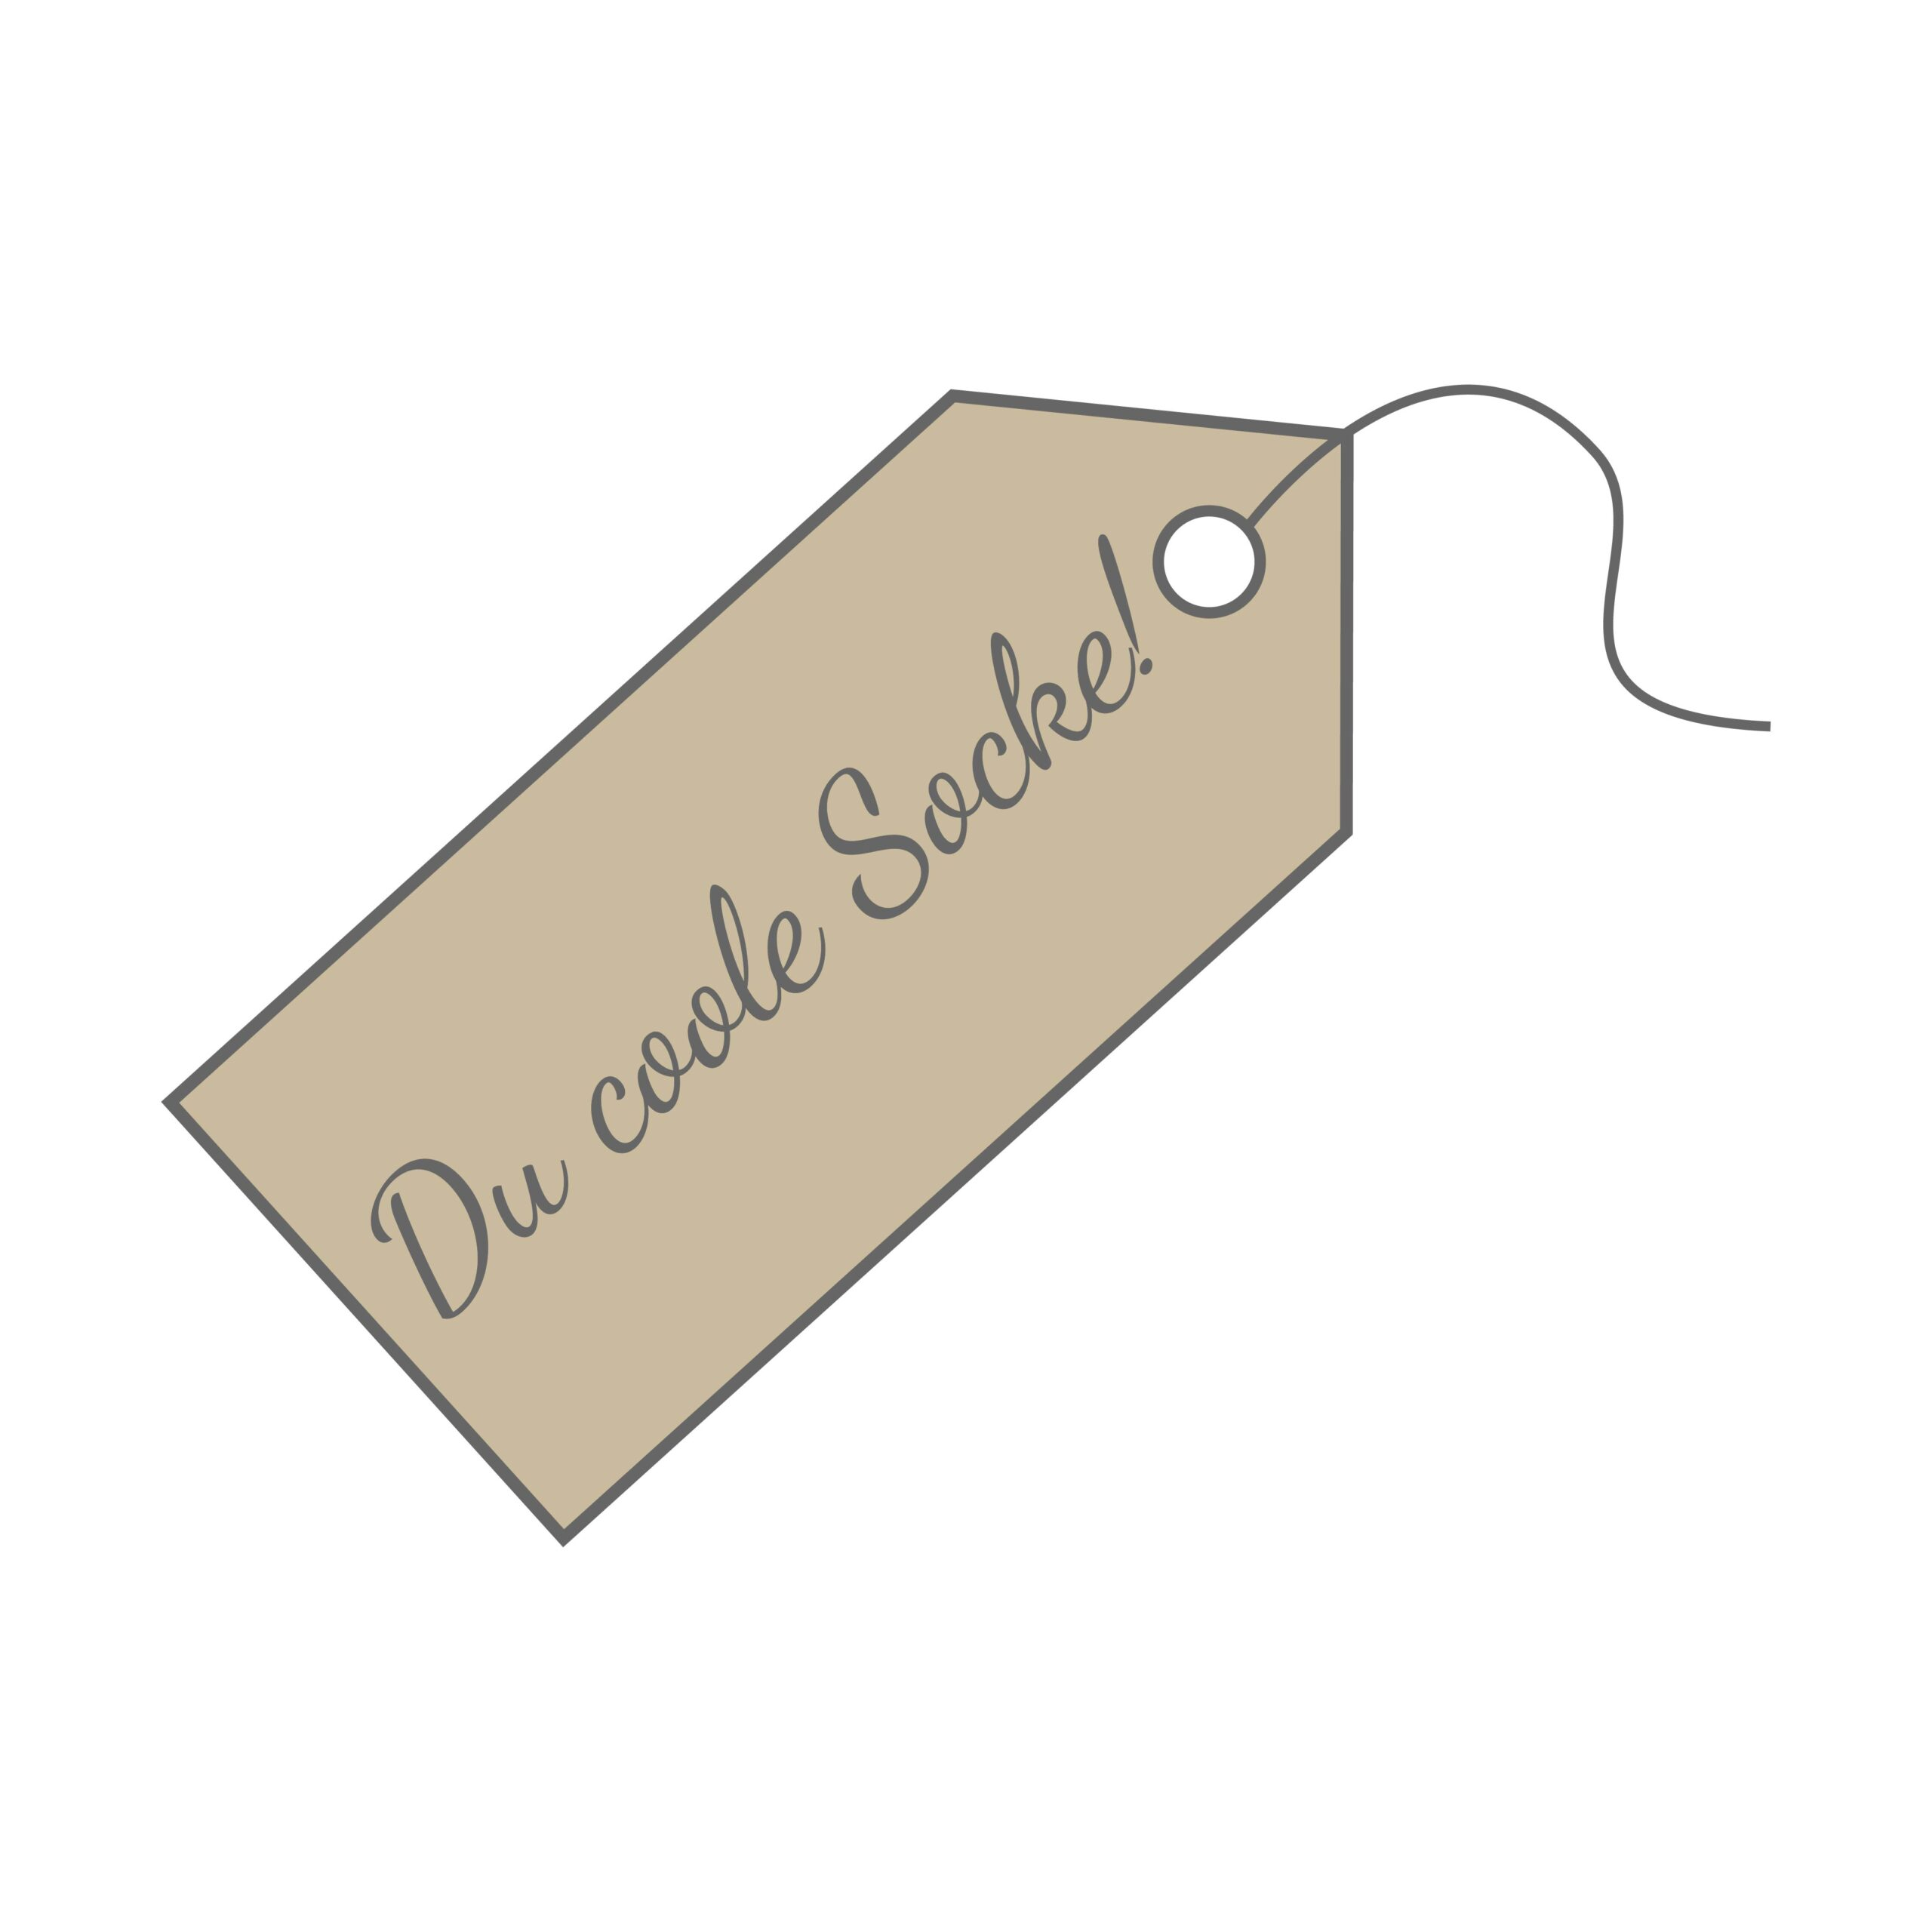 du-coole-socke-label-albertina